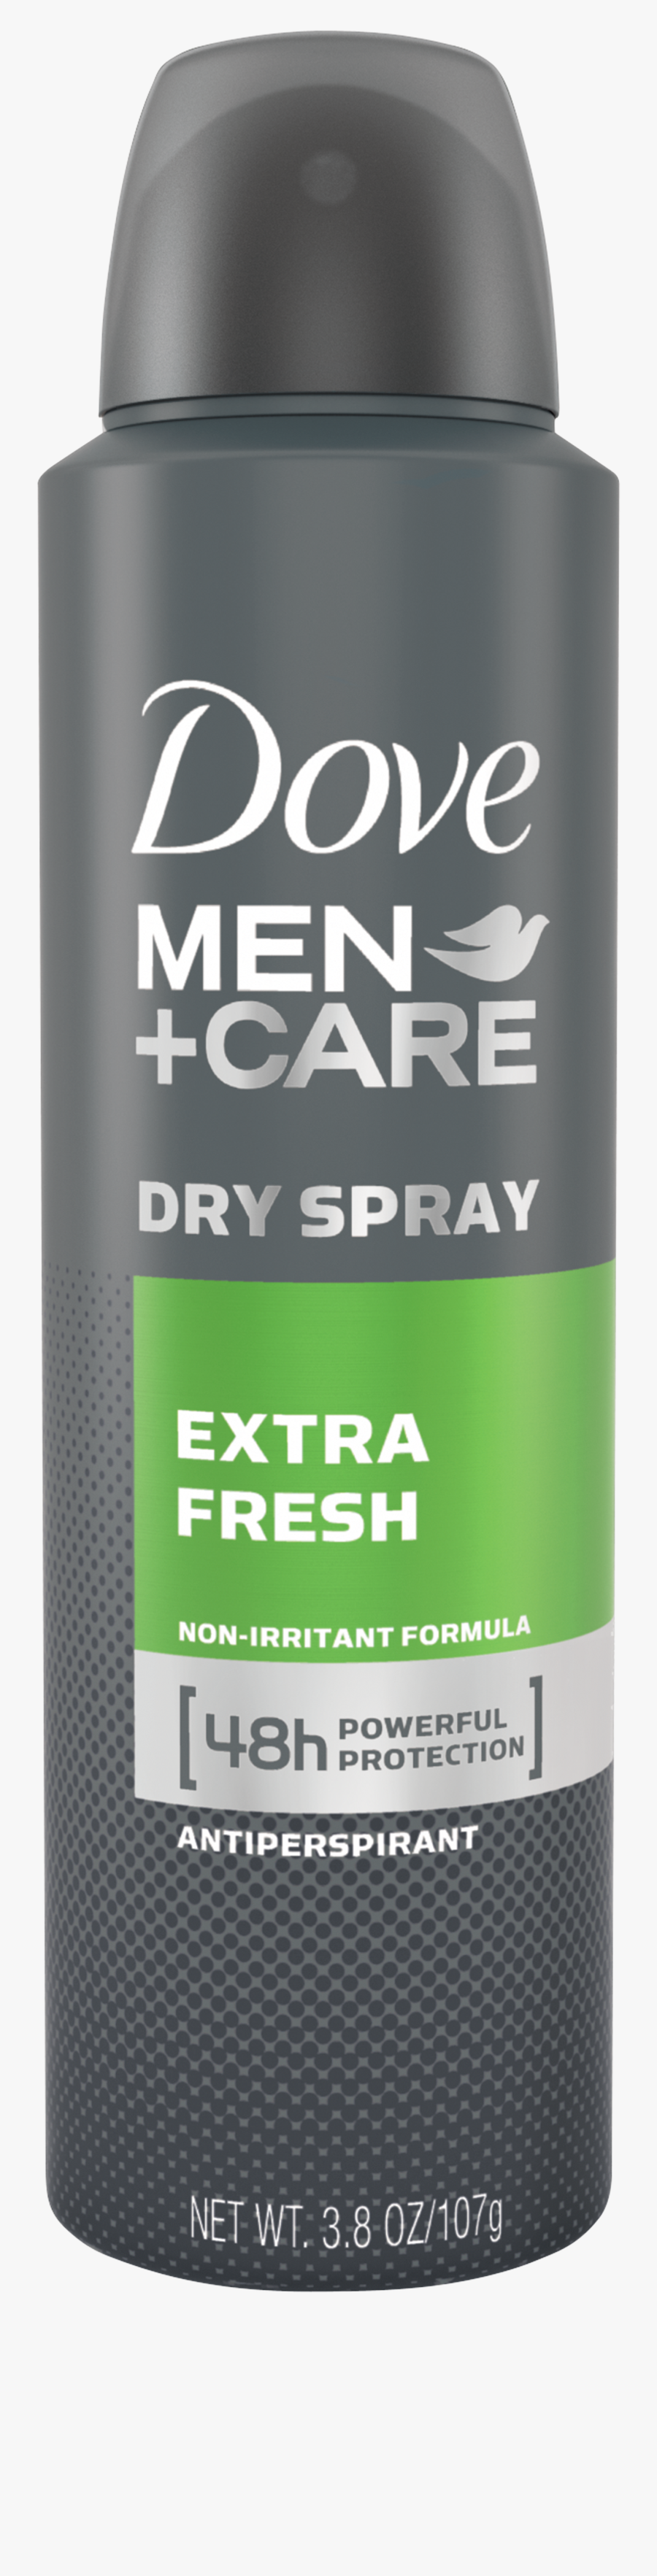 Deodorant Clipart Body Odor - Dove Men's Deodorant Fresh, Transparent Clipart